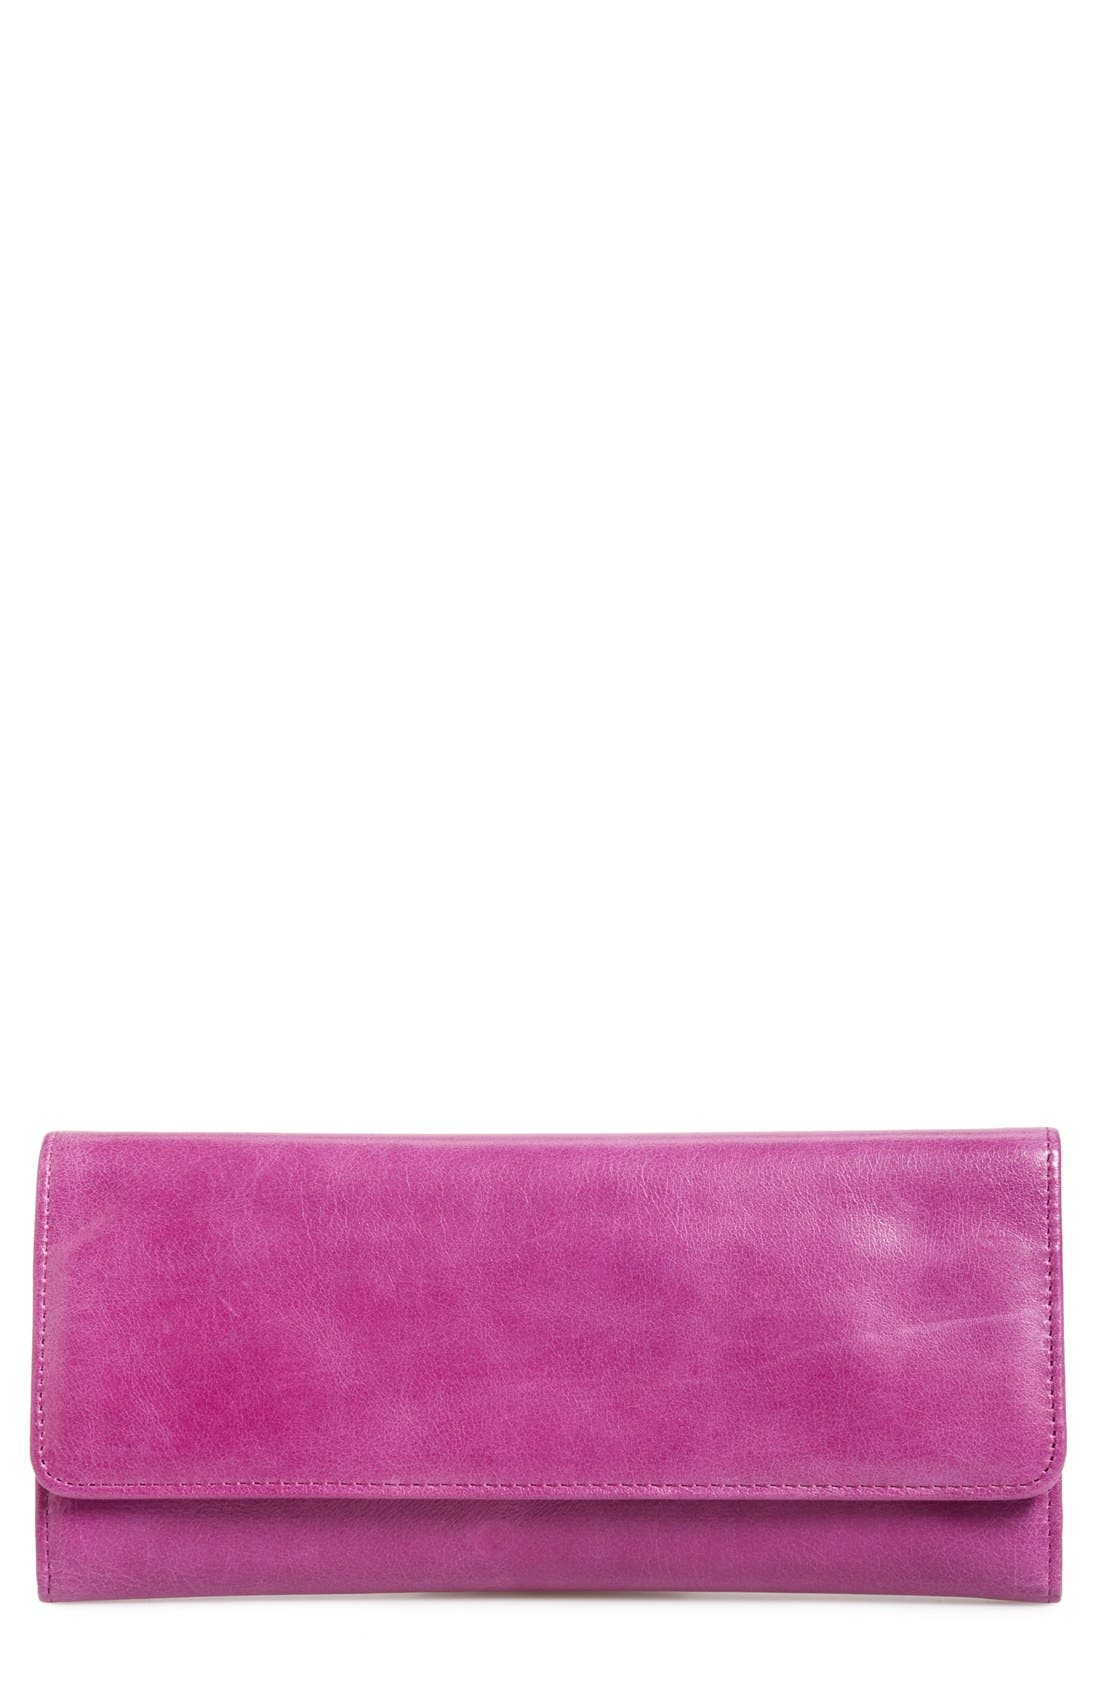 'Sadie' Leather Wallet,                             Main thumbnail 64, color,